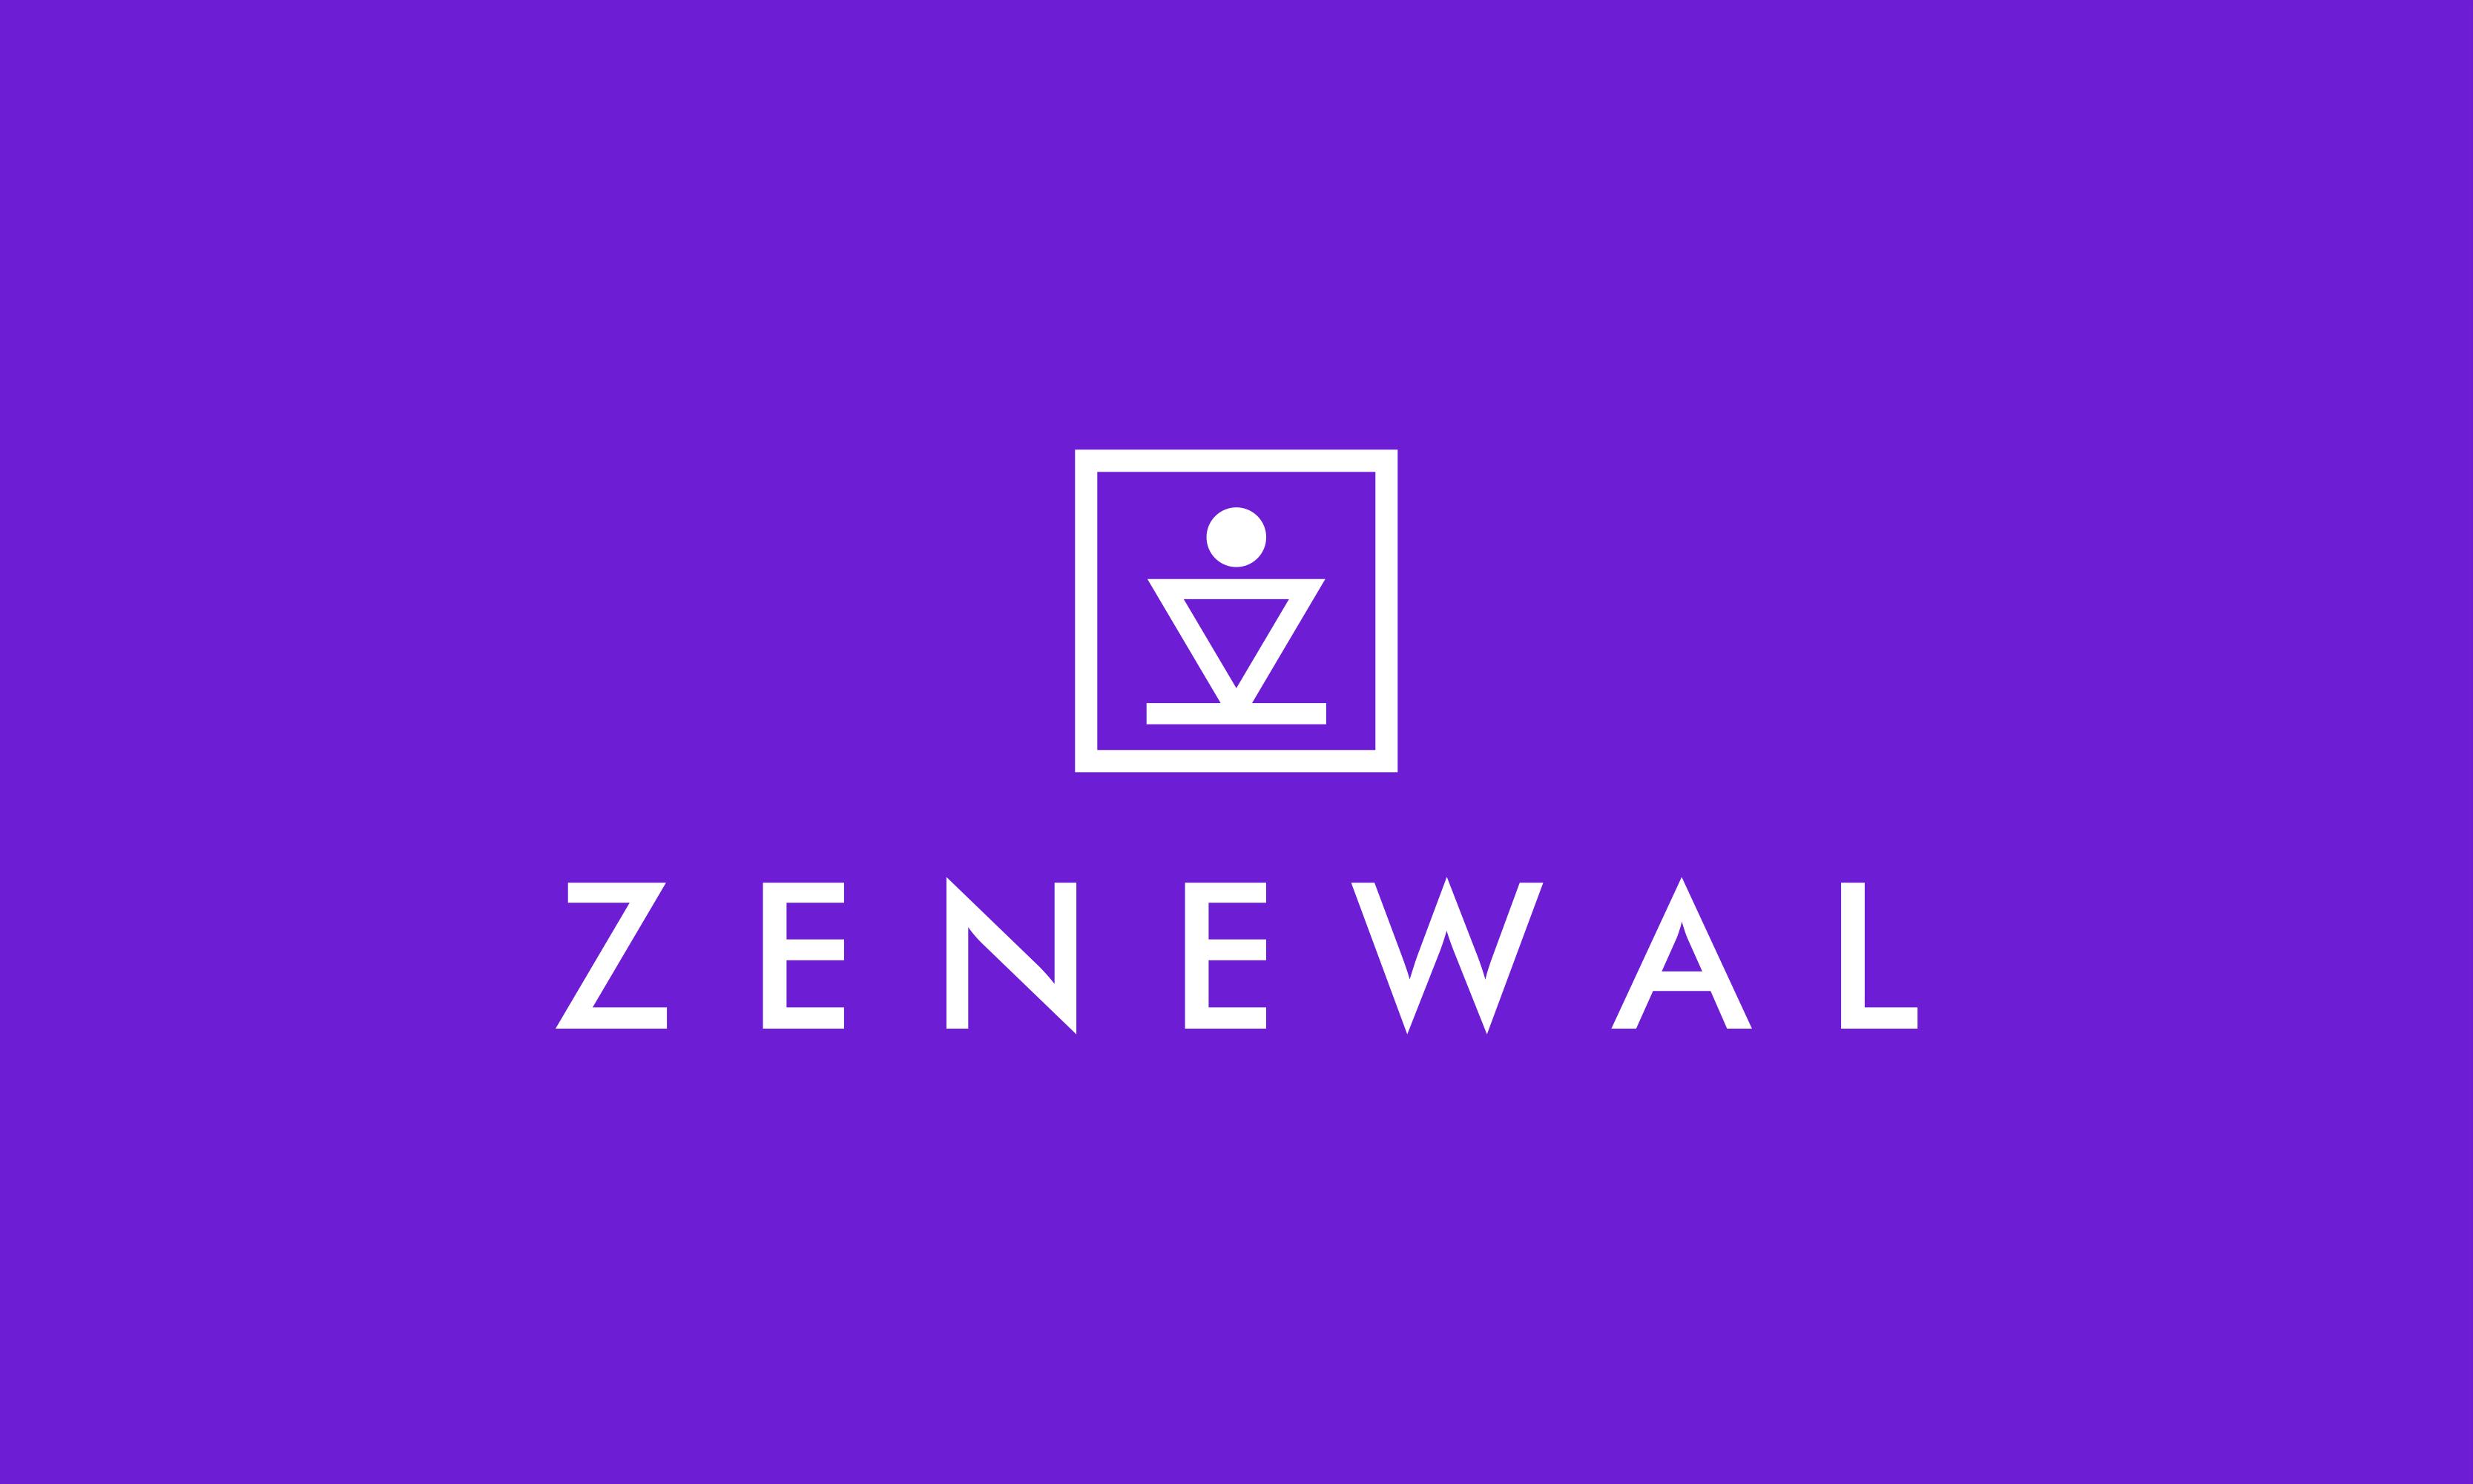 Zenewal